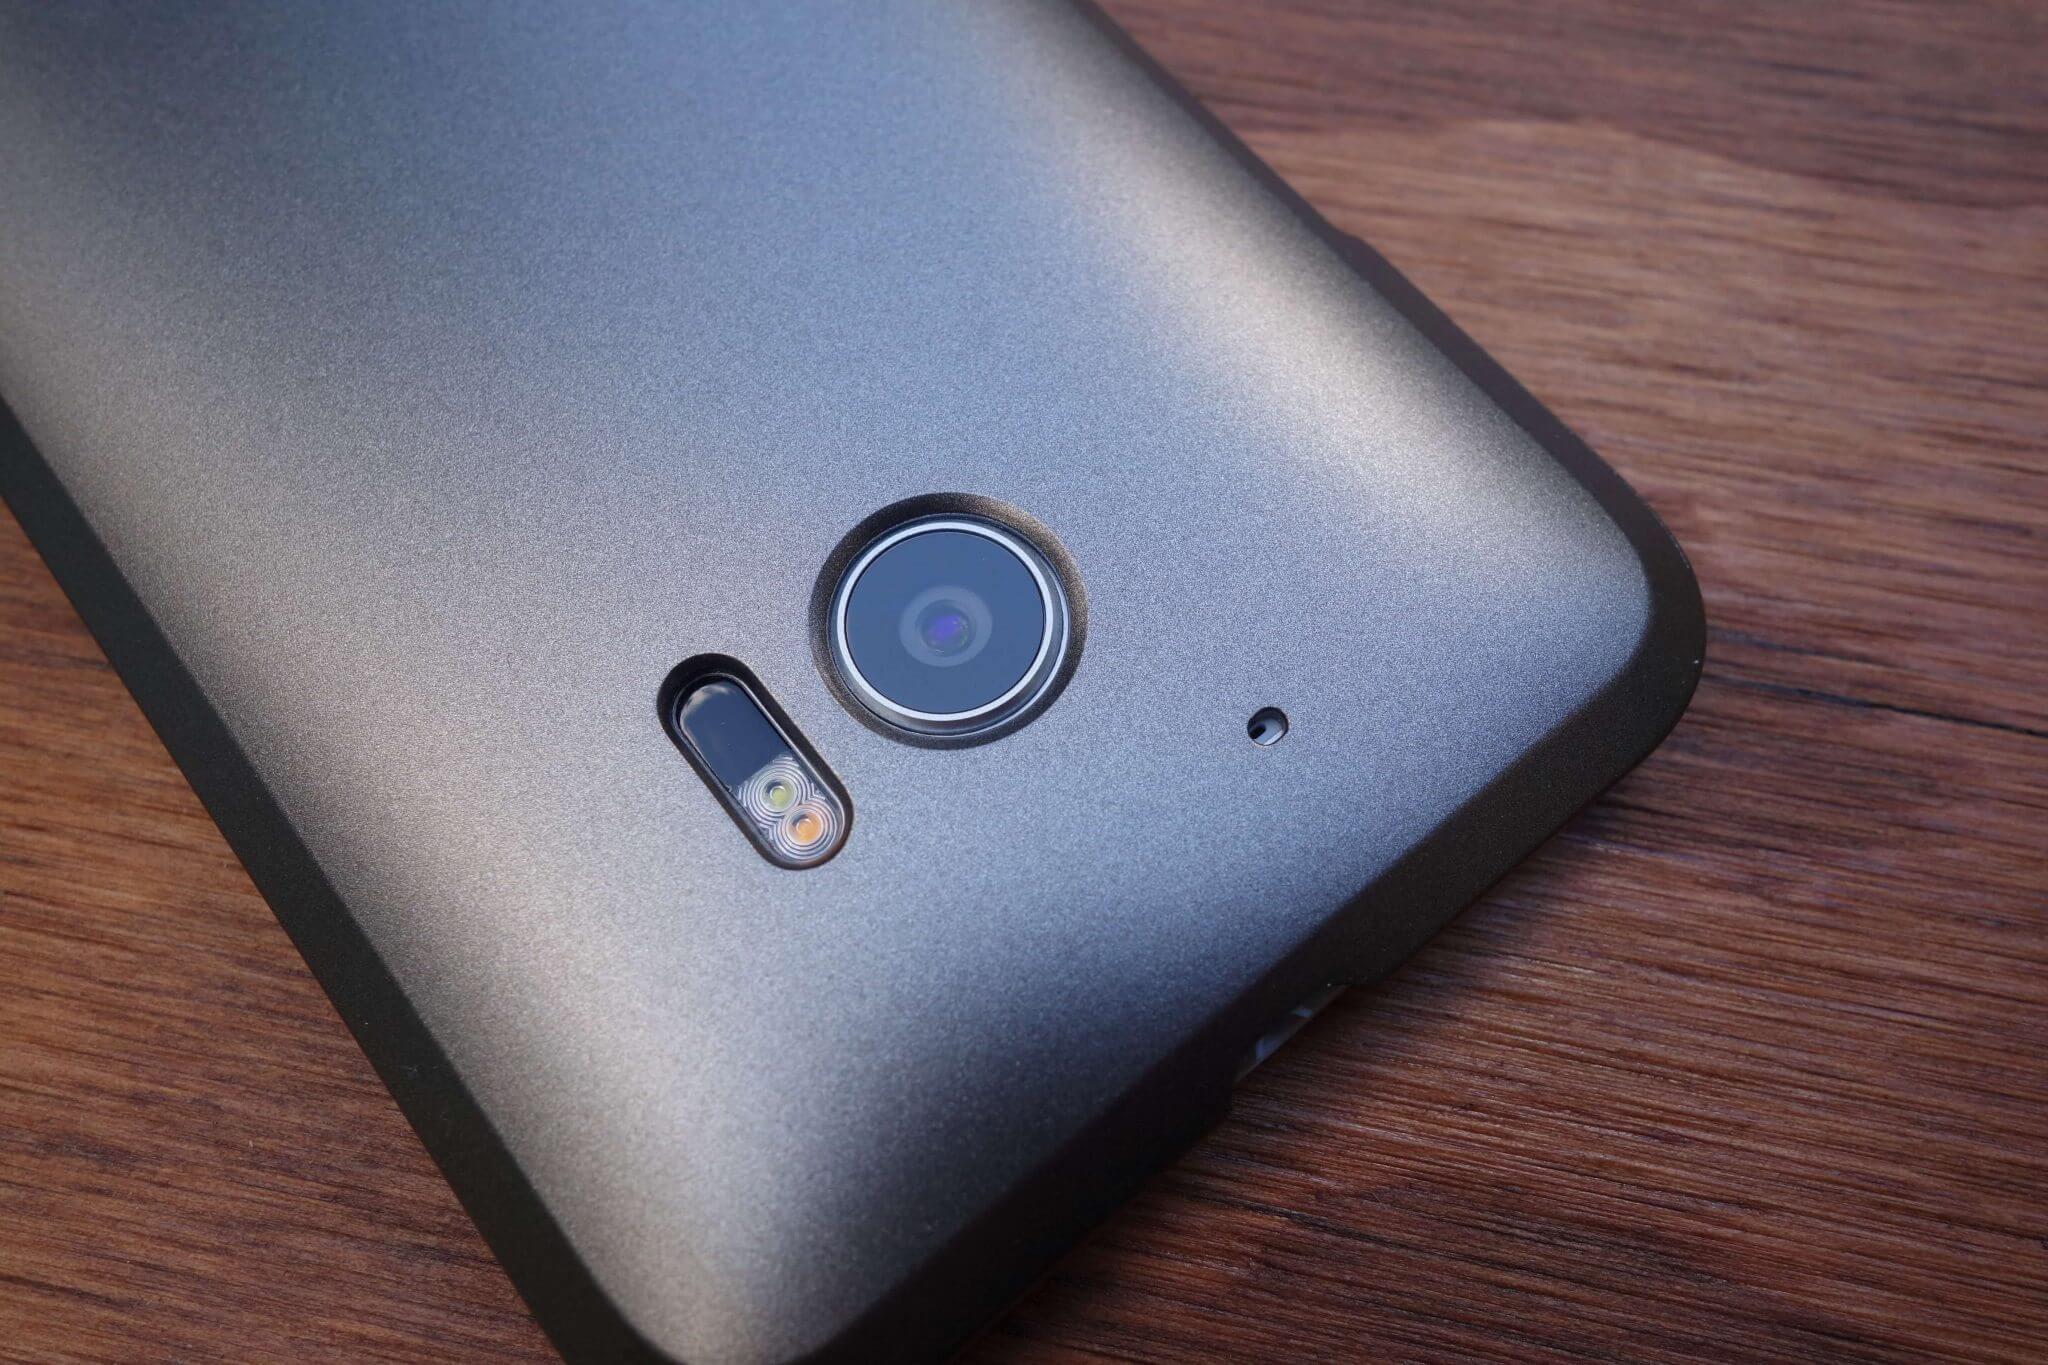 Spigen HTC 10 thin fit gunmetal 8 - [Rumor] HTC 11 virá com Snapdragon 835 e 6 GB de memória RAM